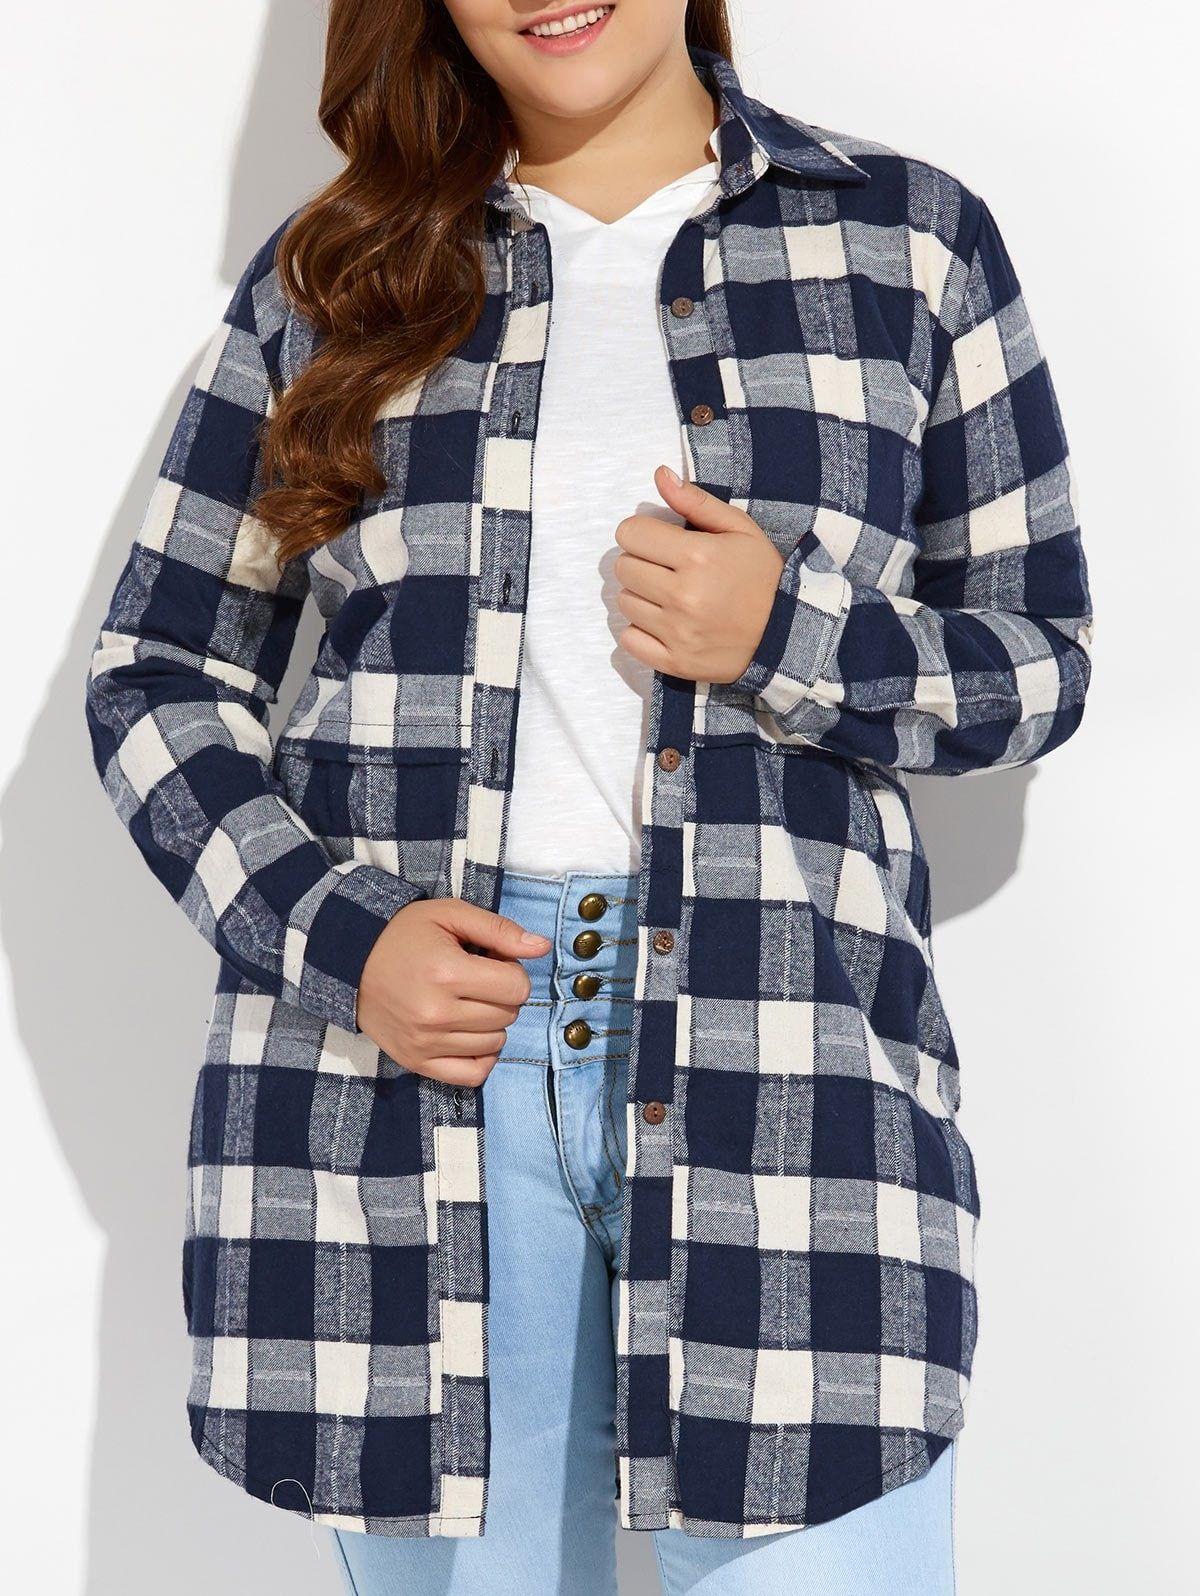 Flannel shirt plus size  Plus Size Plaid Button Up Long Flannel Shirt  Awesome flannels